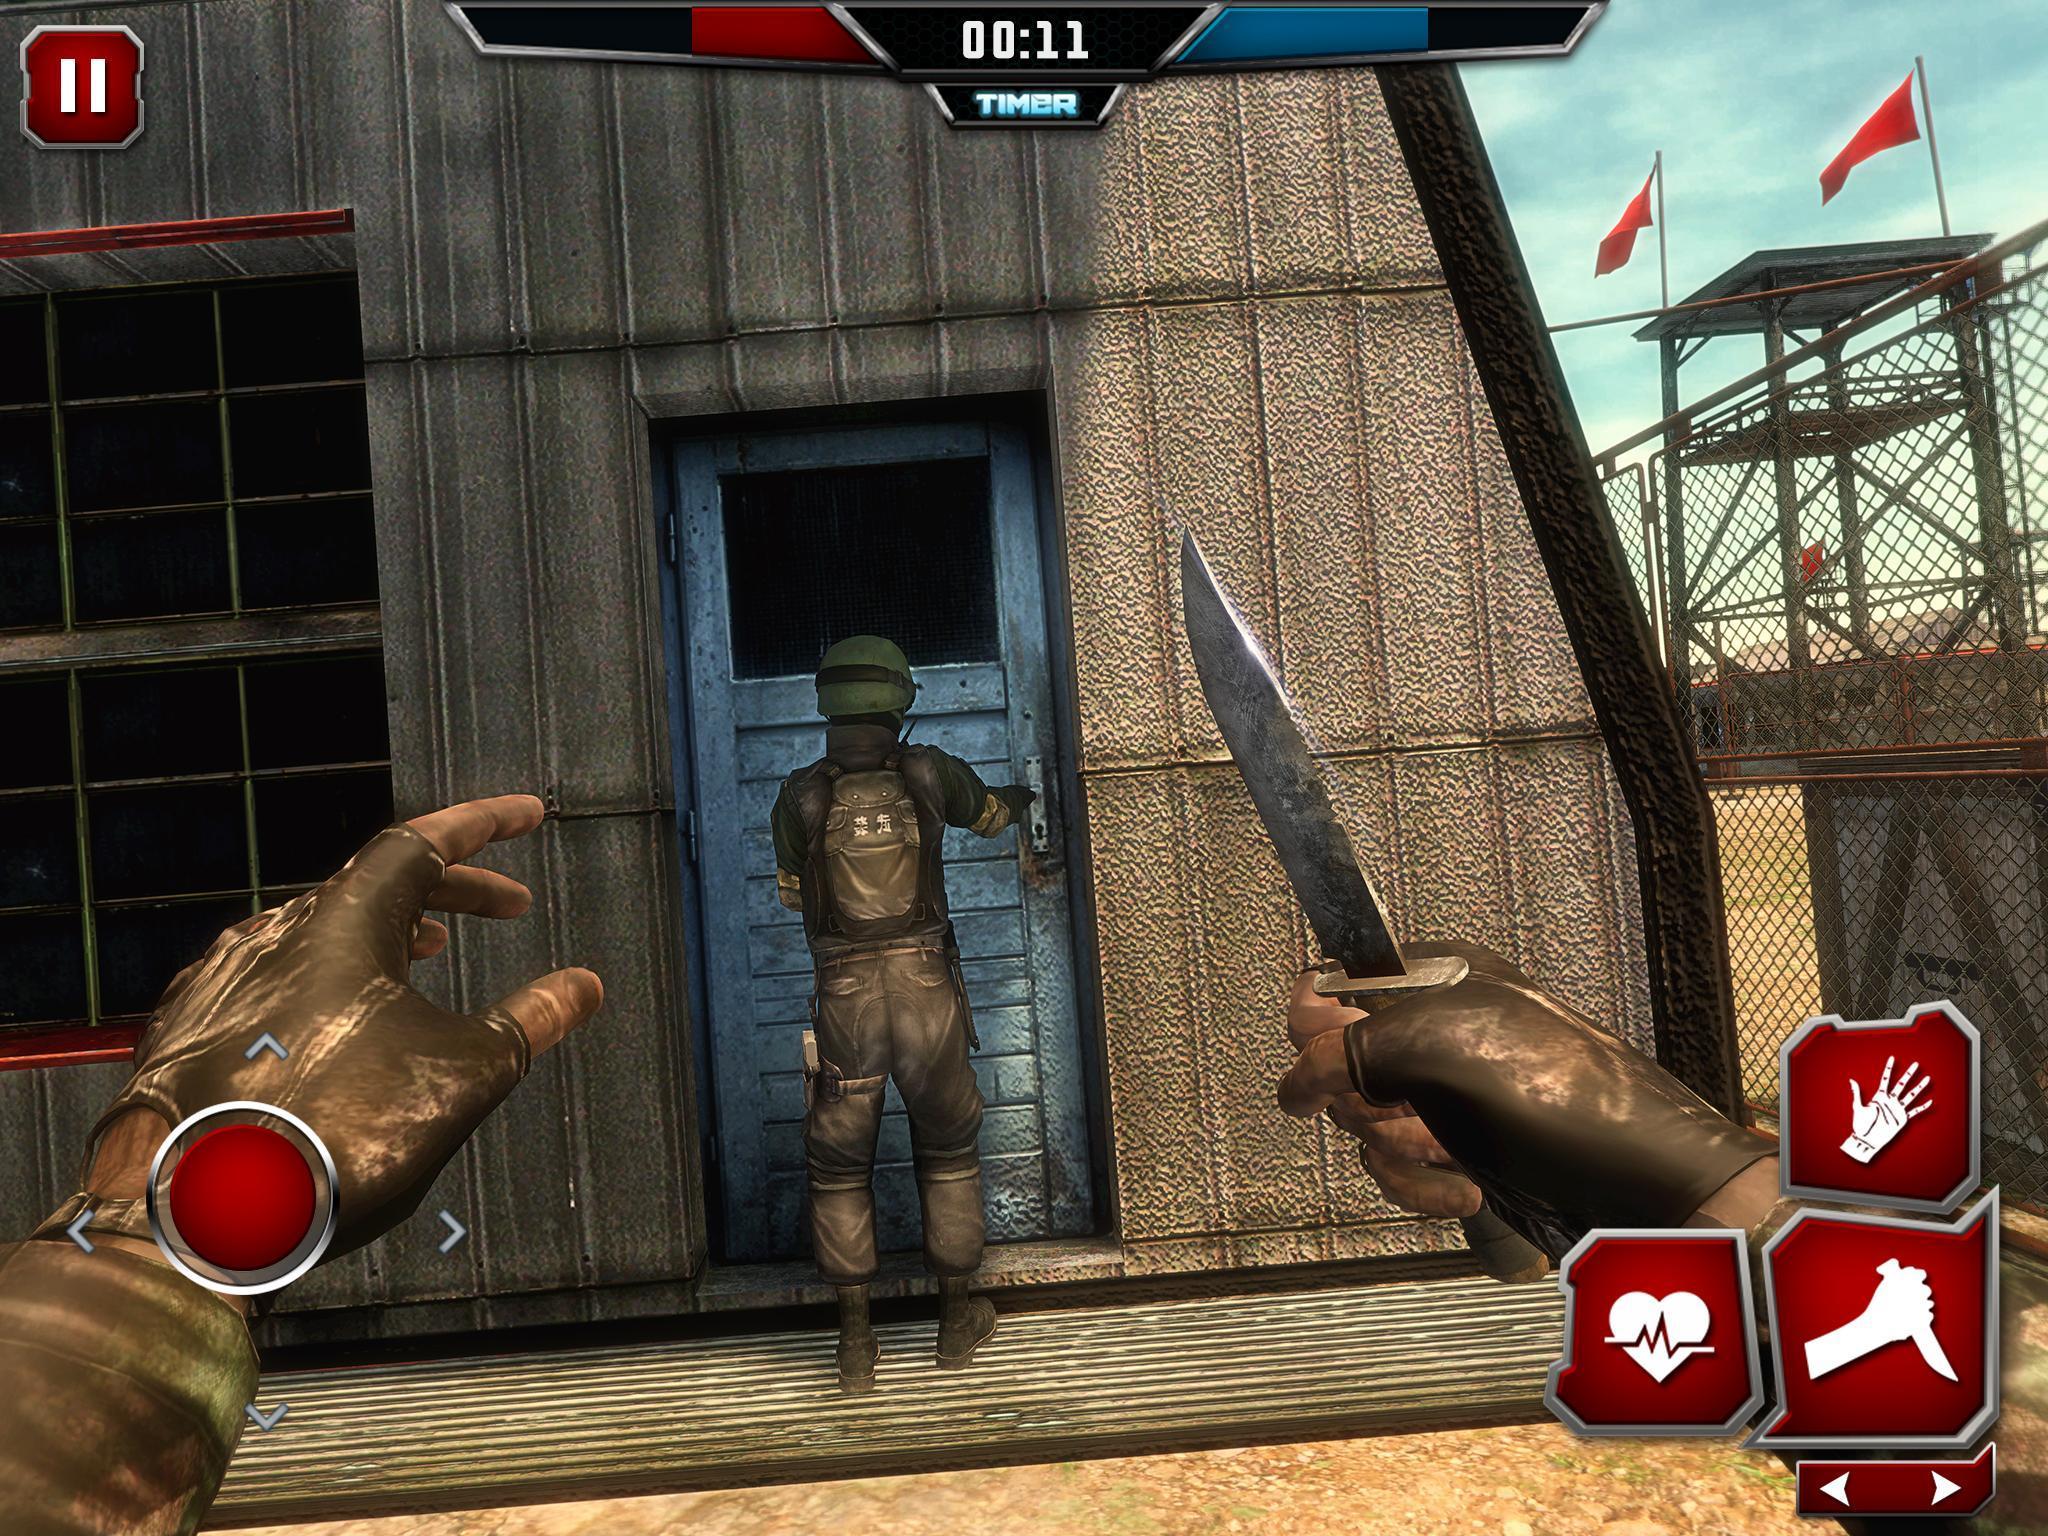 American Sniper Assassin Secret Agent 3d Game For Android Apk